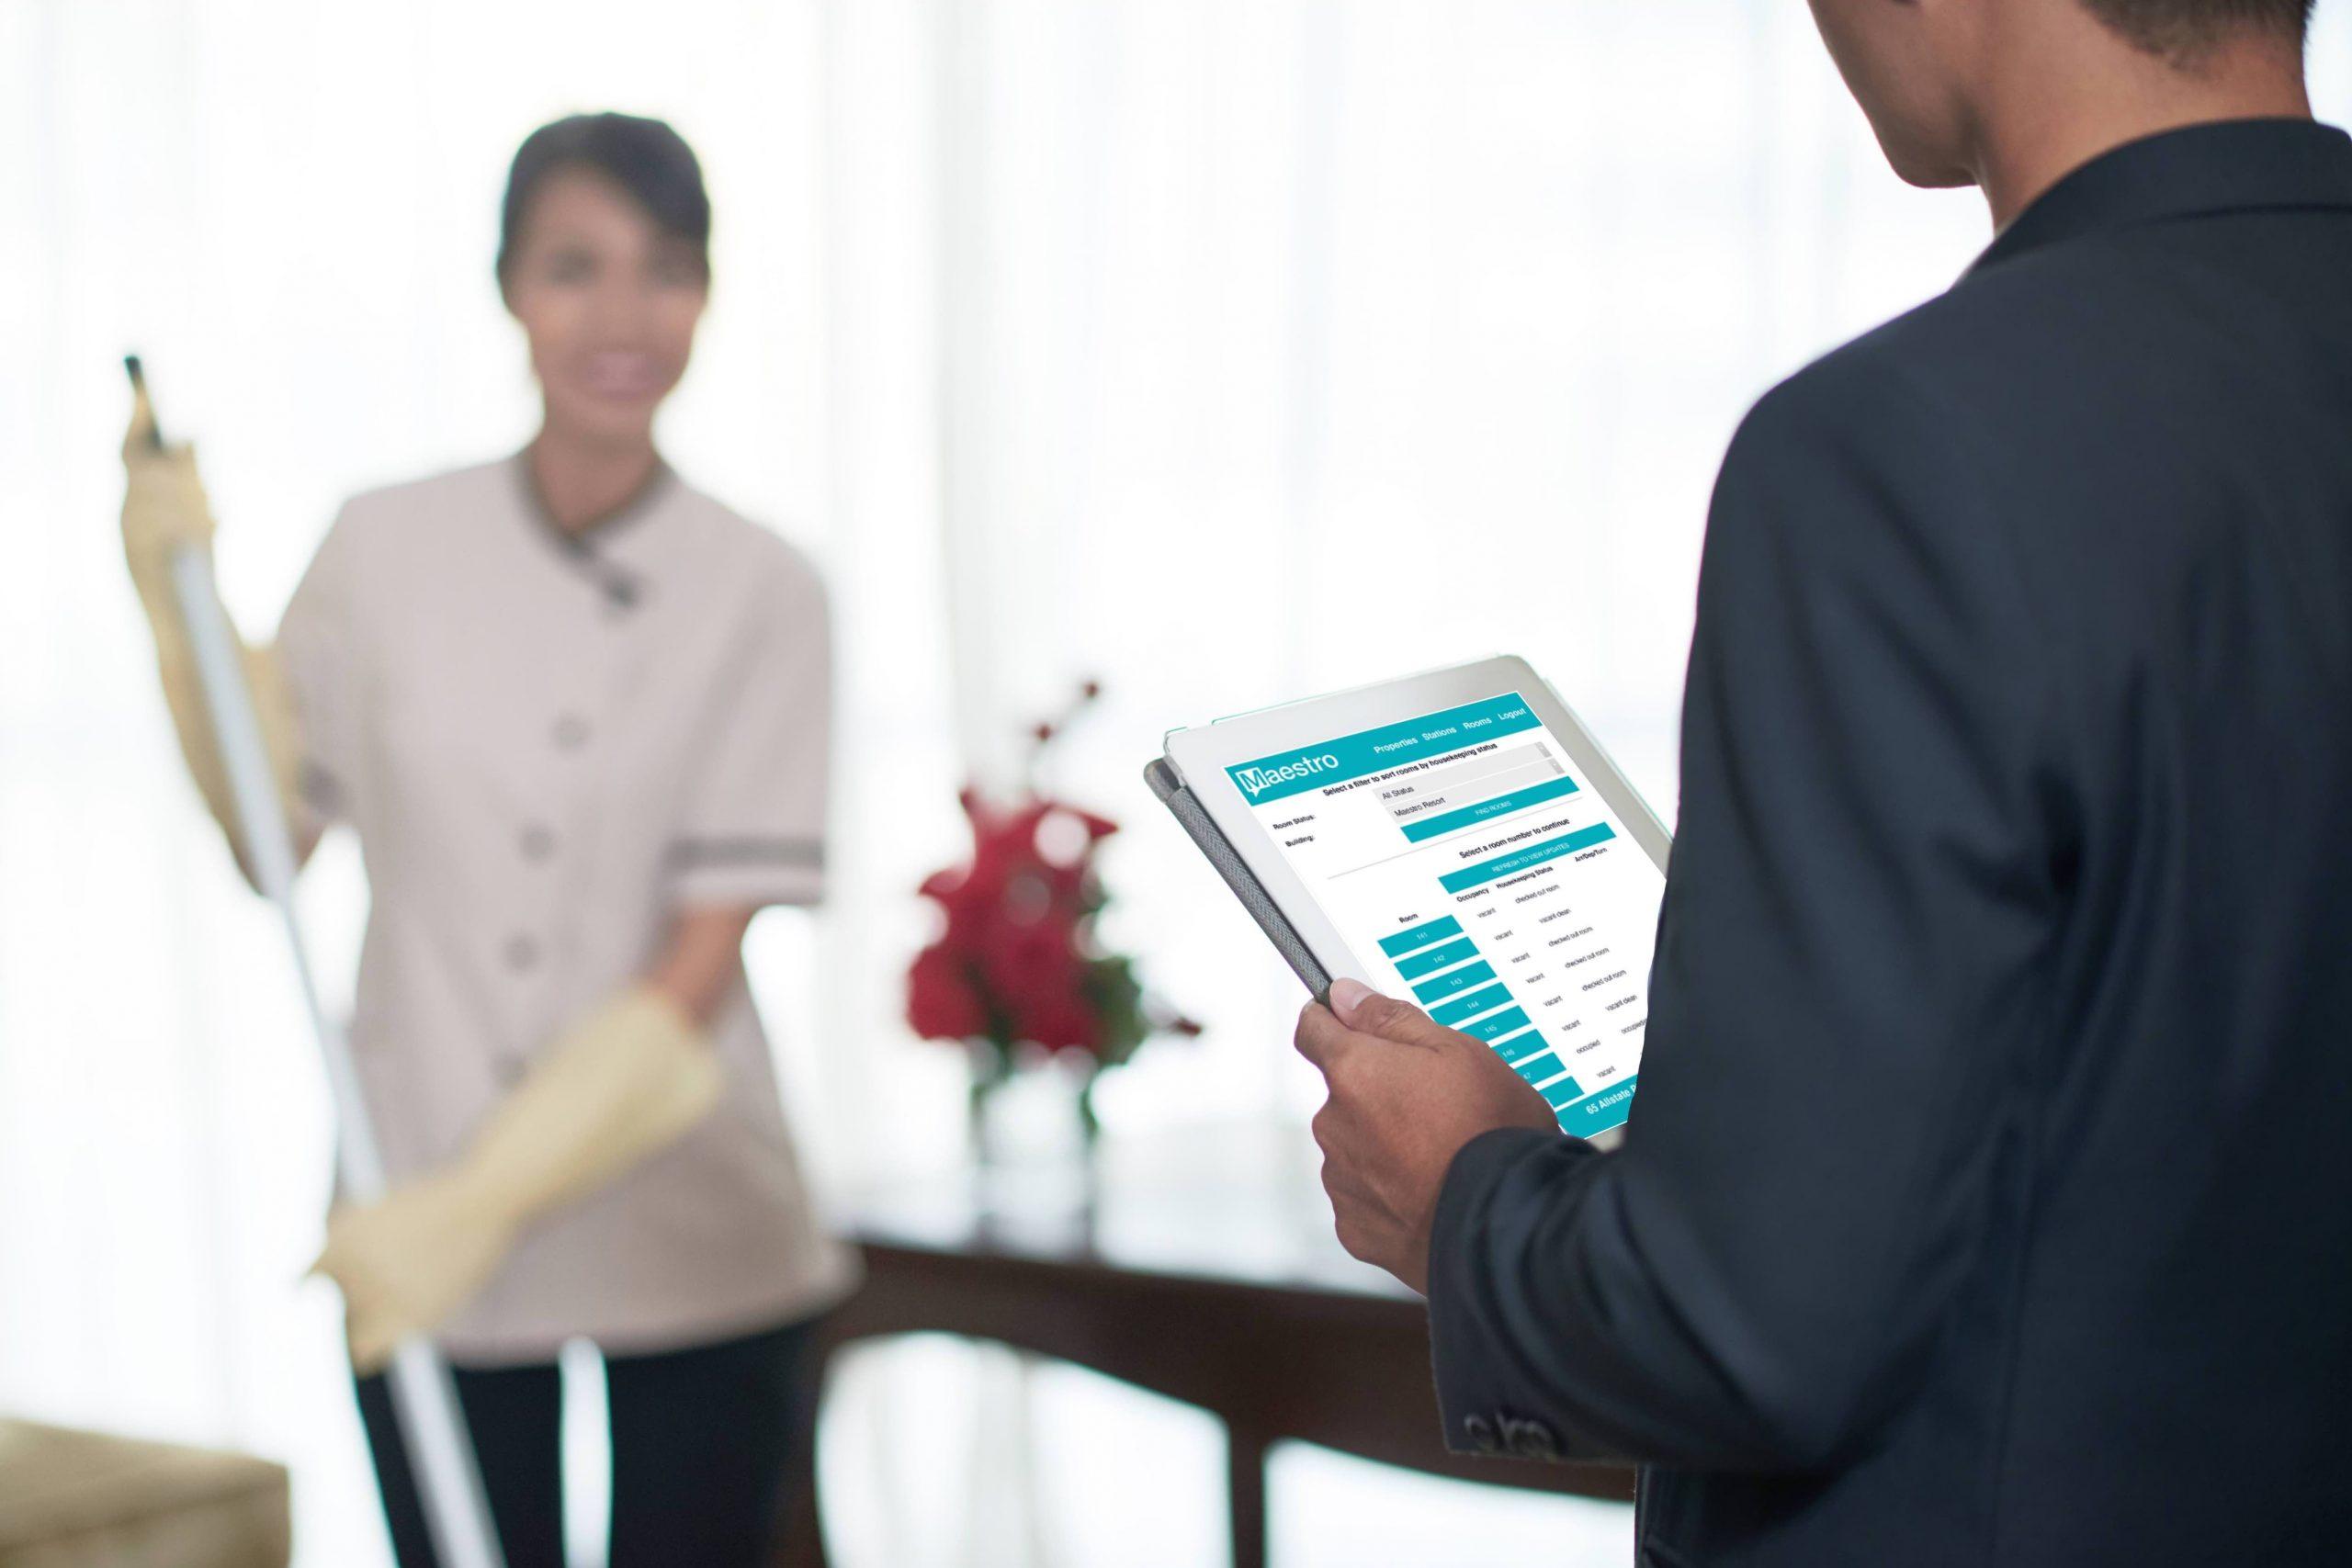 ipadhousekeepingimage scaled - Home - Innovative Property Management Software Solutions Powering Hotels, Resorts & Multi‑Property Groups.